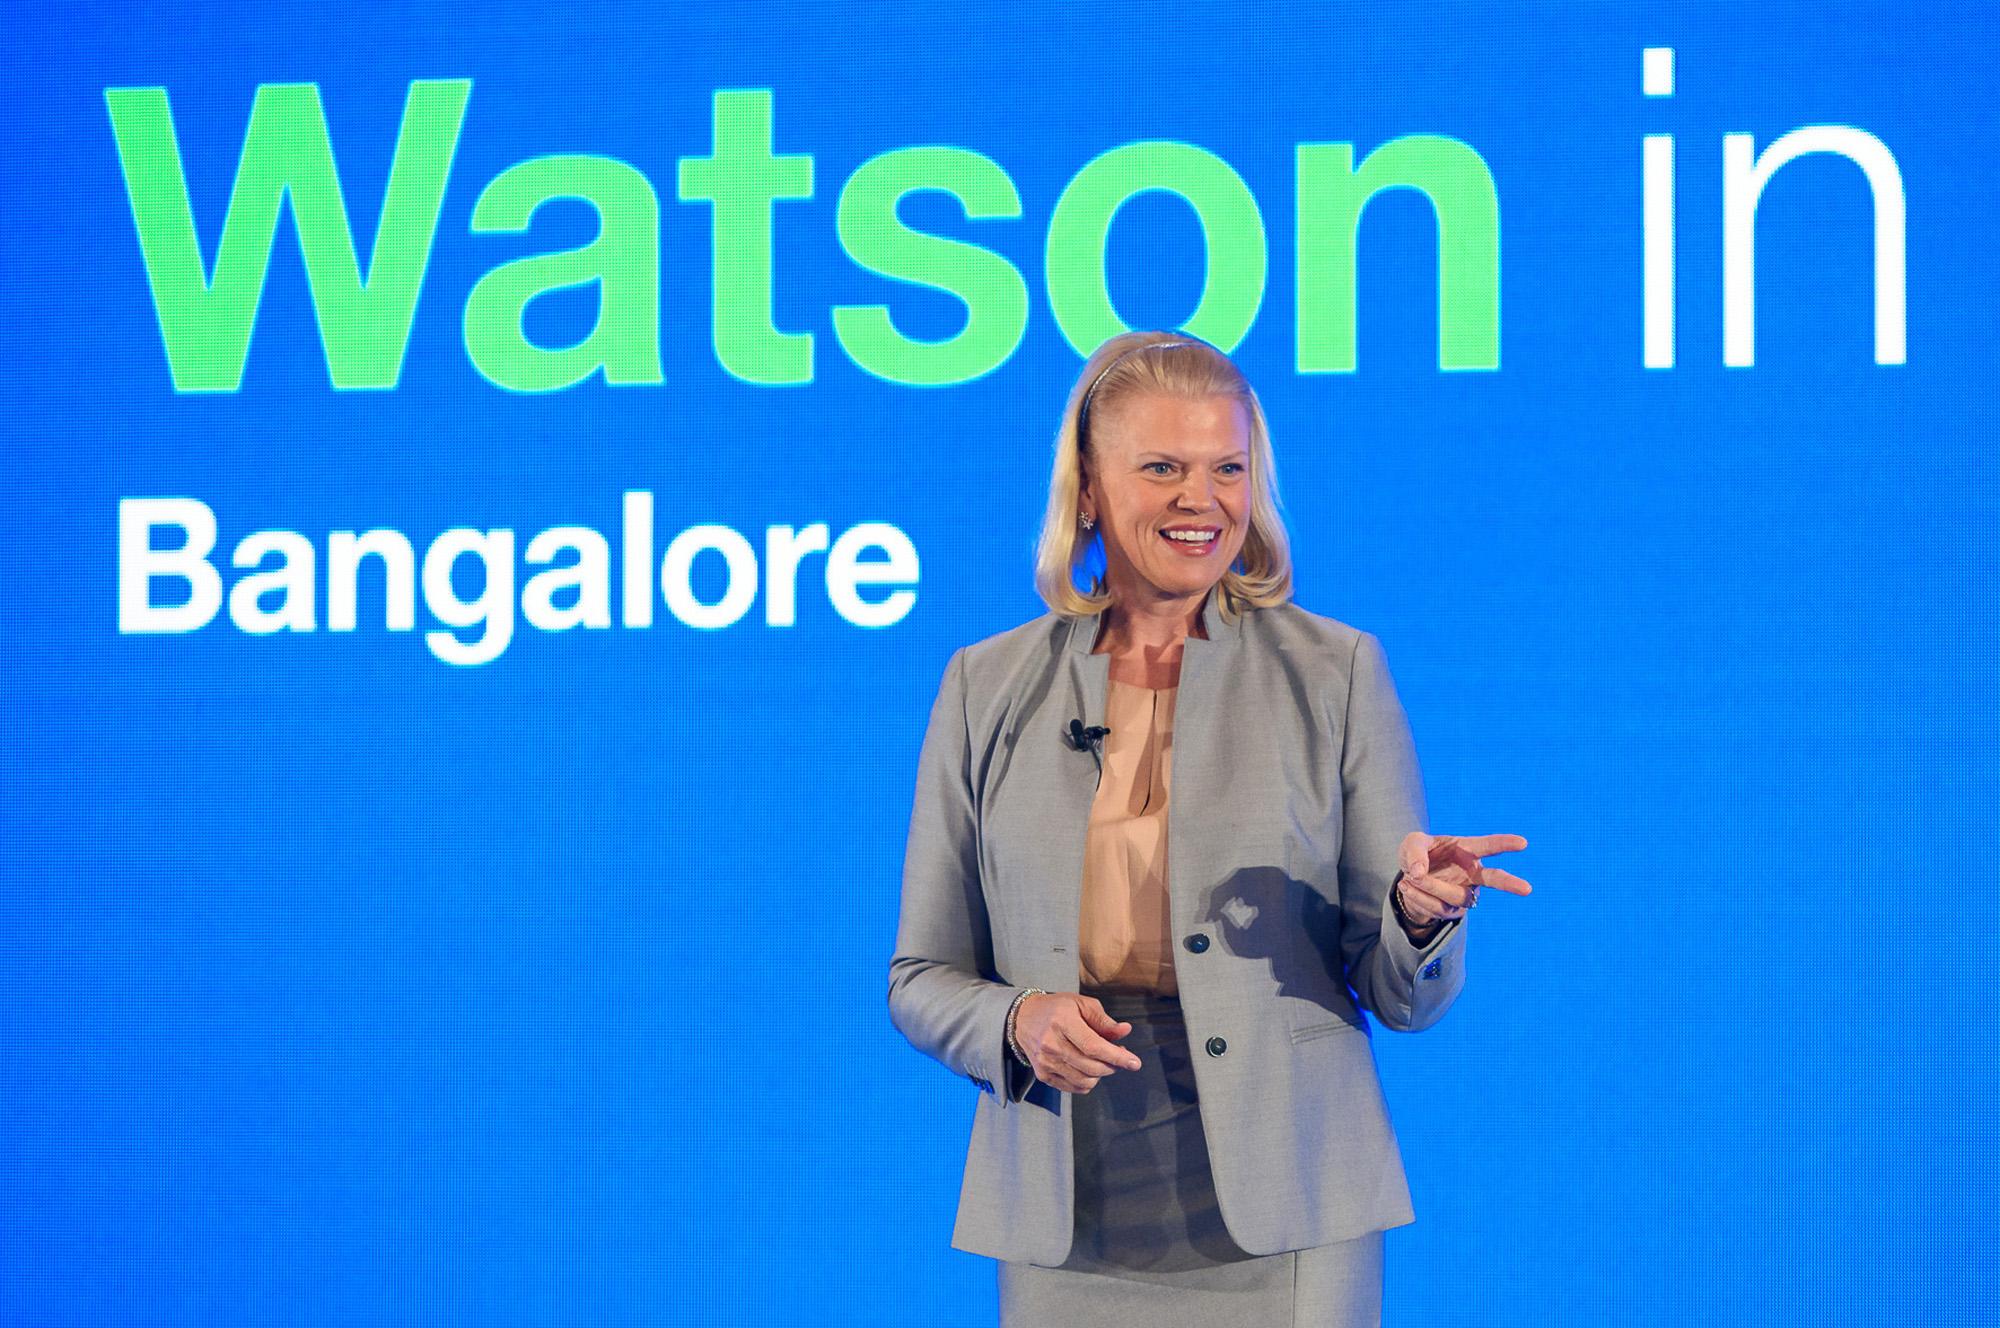 IBM CEO Ginni Rometty speaks about Watson.